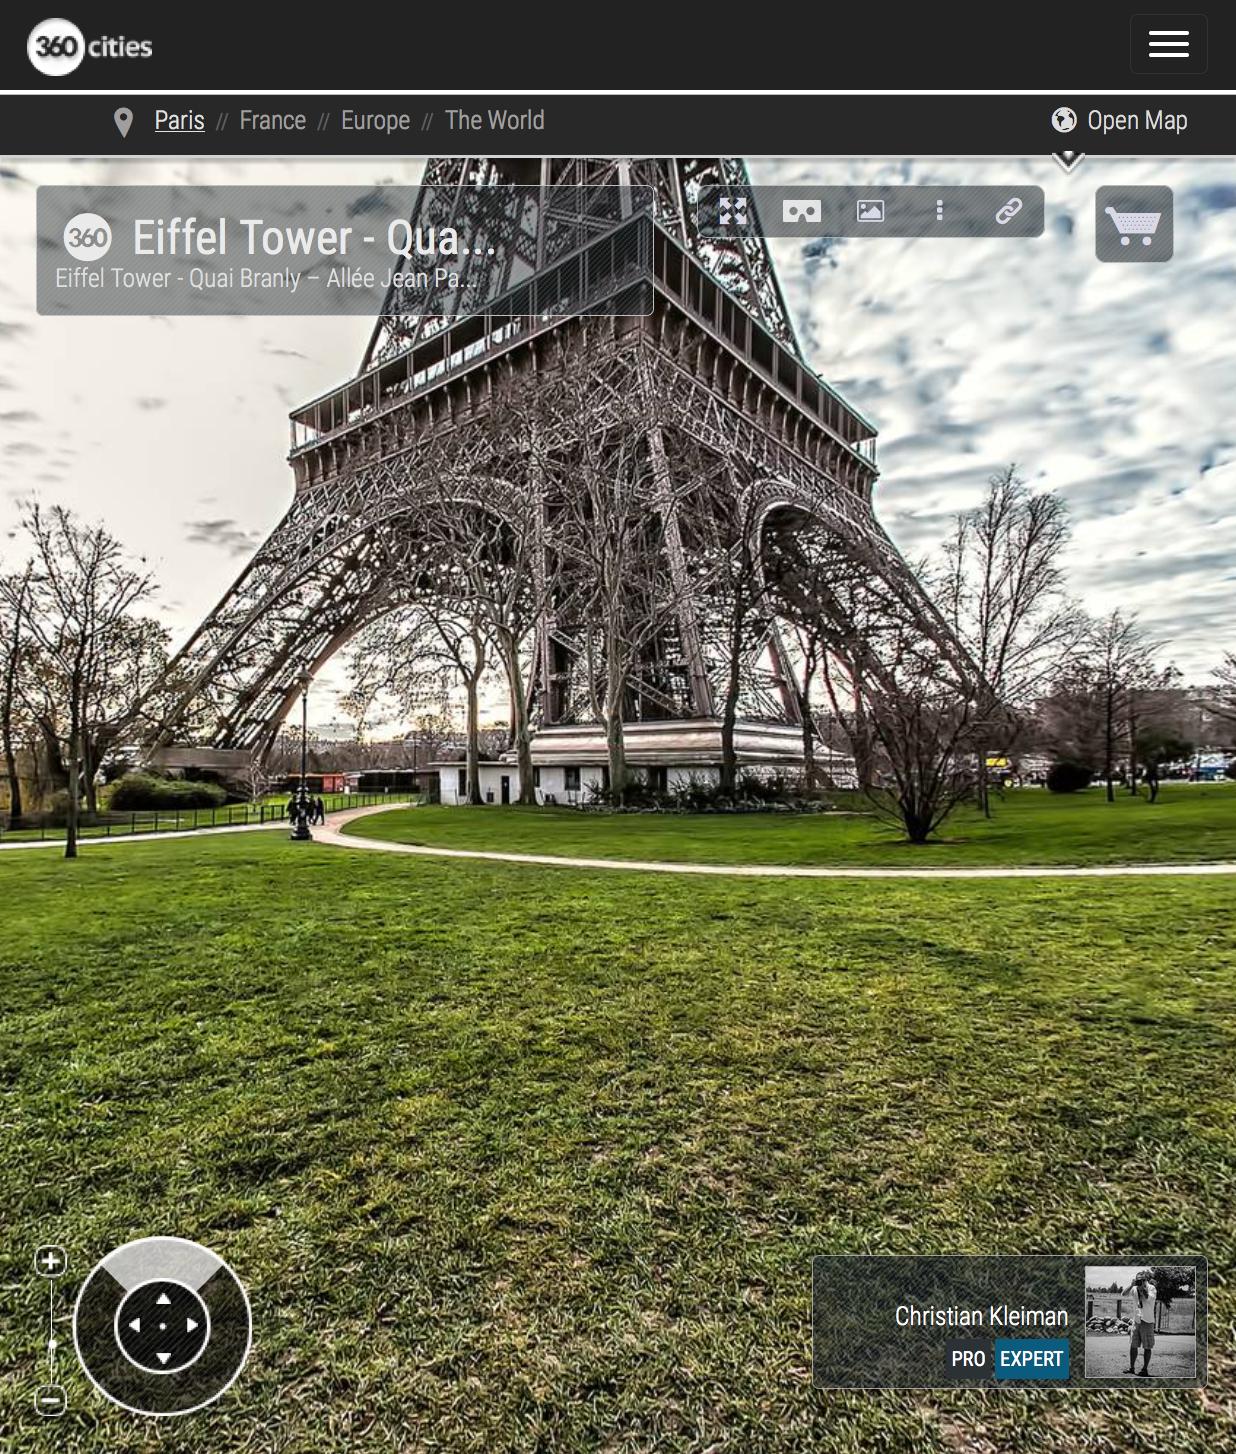 Eiffel Tower Paris - Quai Branly - Allée Jean Paulhan - Creative 360 VR Spherical Panoramic Photography - Emblematic Paris by © Christian Kleiman